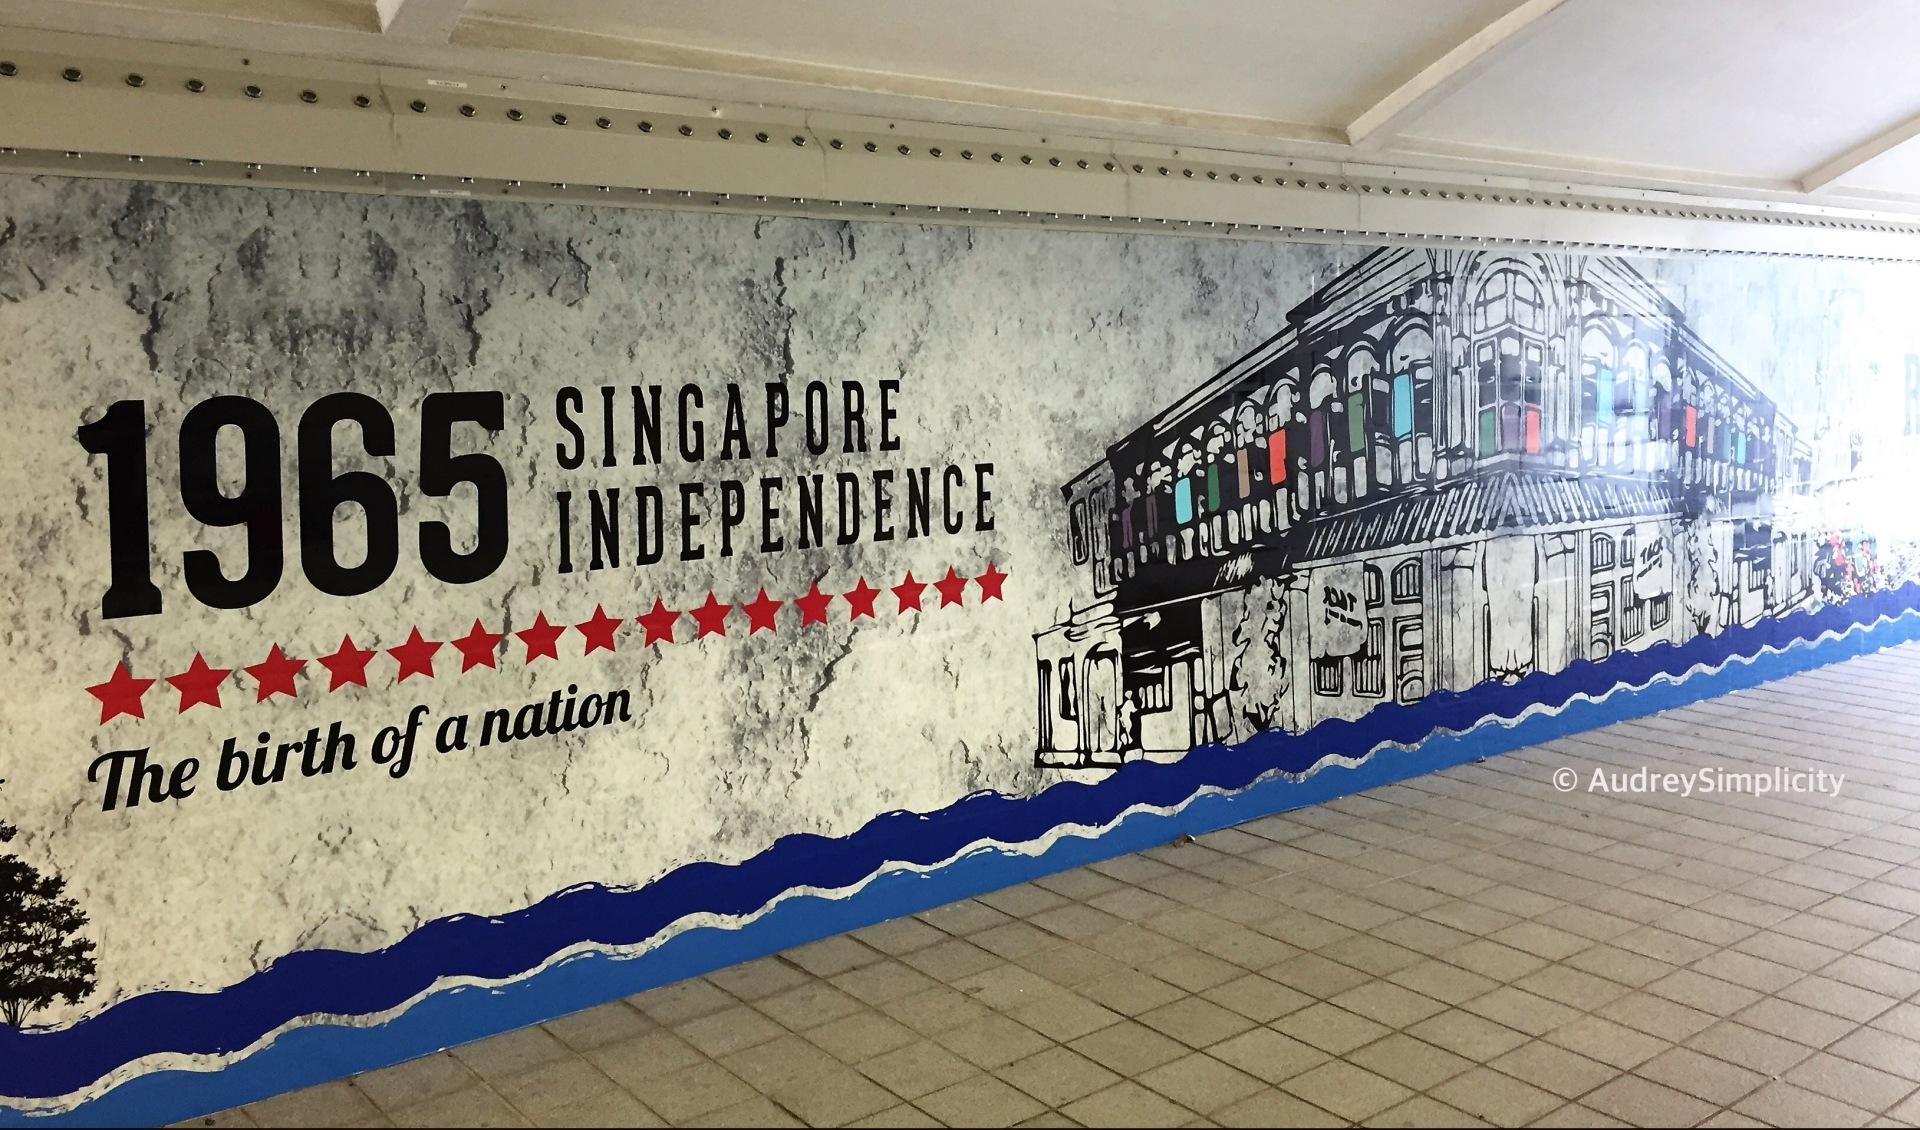 1965 Singapore Independence